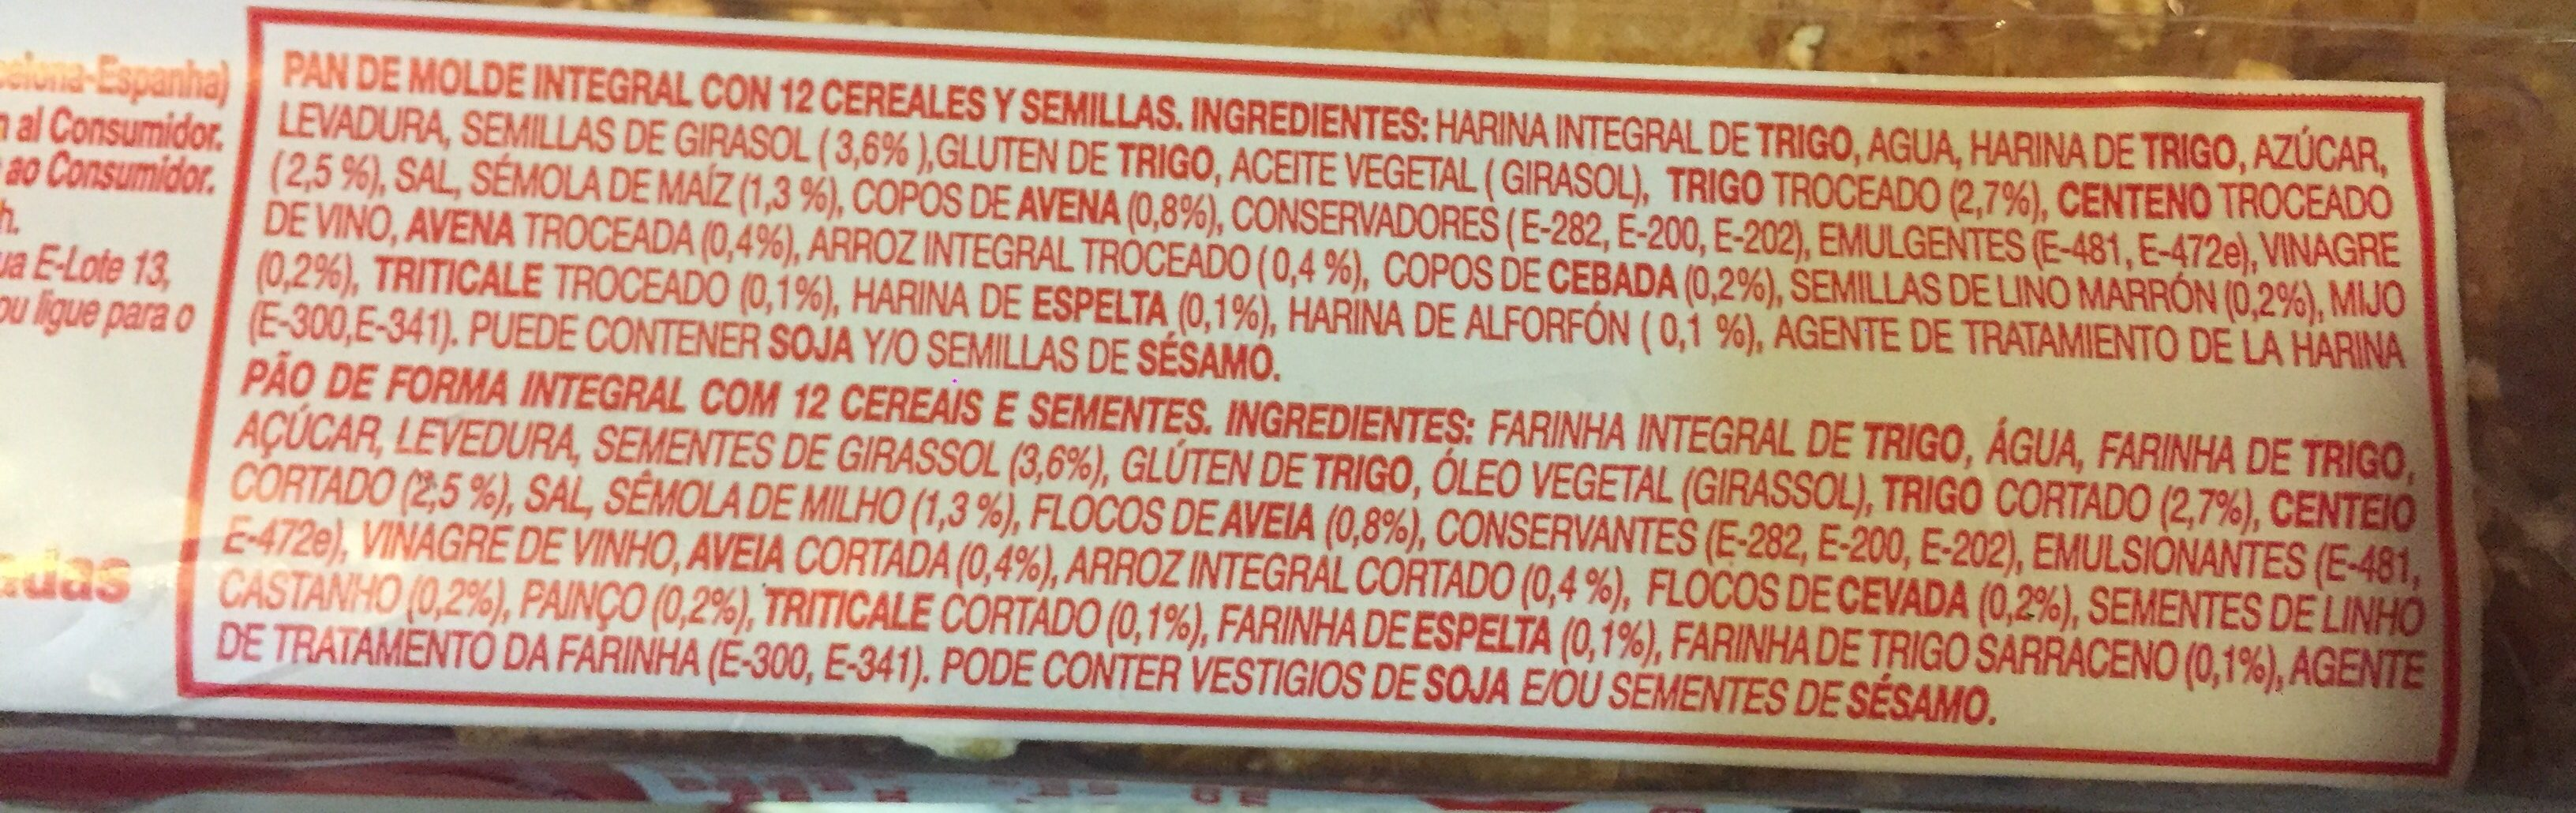 Oroweat 12 cereales y semillas - Ingrédients - fr